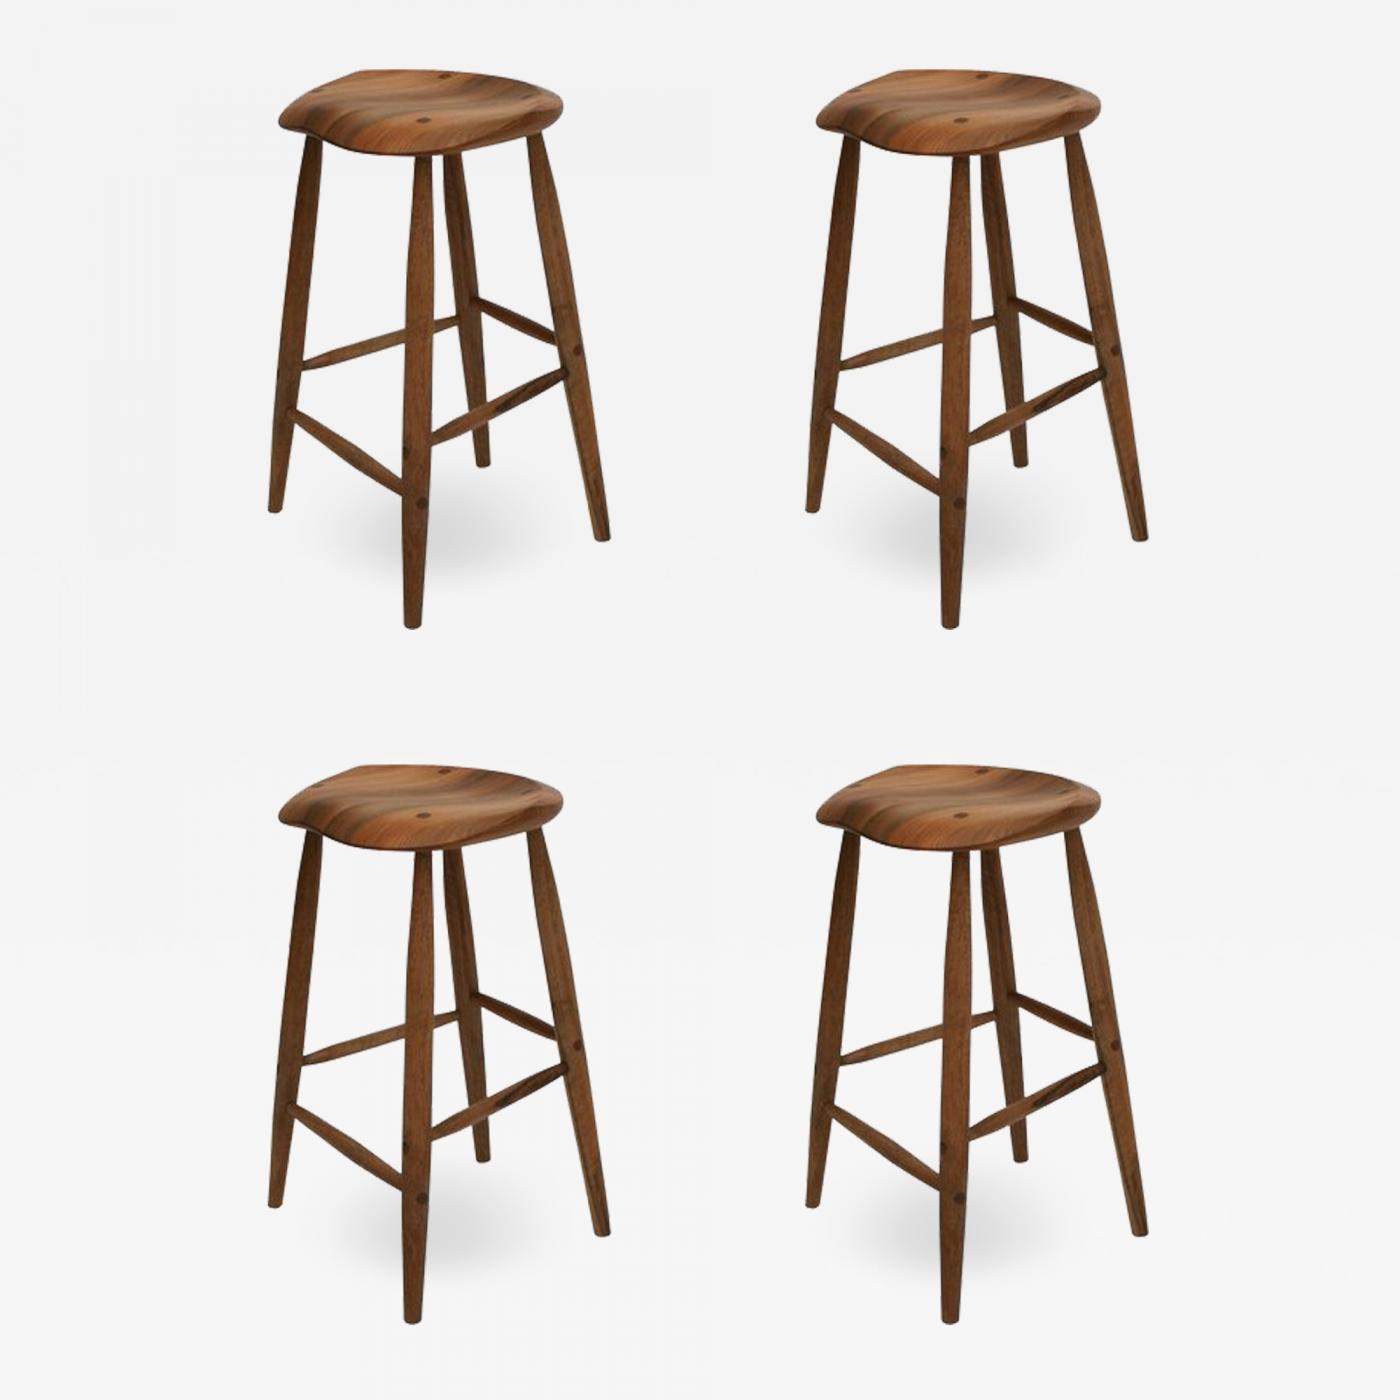 Miraculous Fabian Fischer Handcrafted Studio Four Legged Stool By Fabian Fischer Germany 2019 Ibusinesslaw Wood Chair Design Ideas Ibusinesslaworg